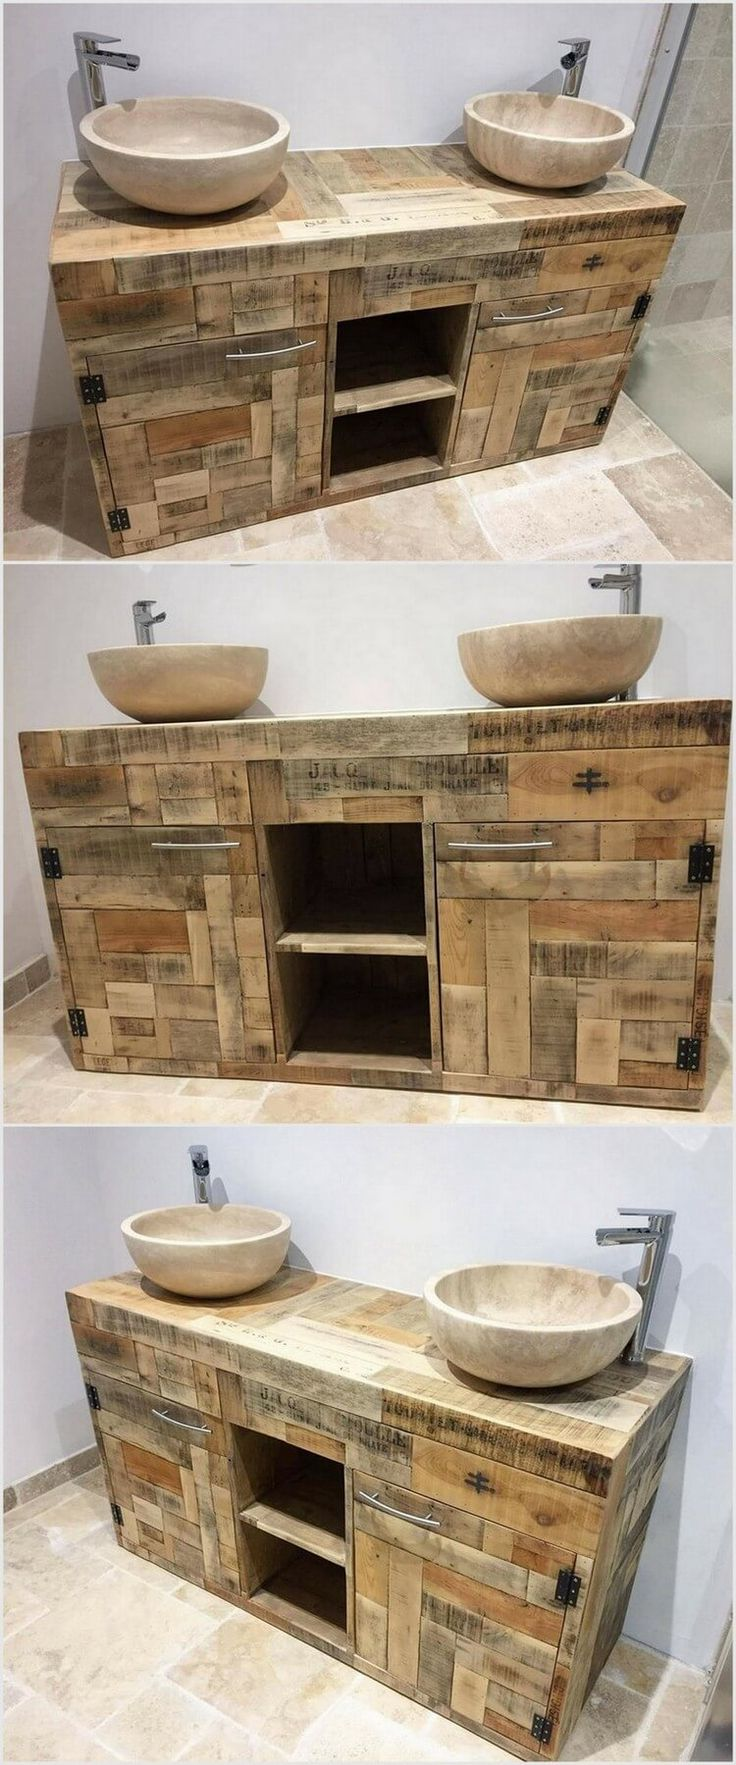 Pallet Wall Bathroom Best 25 Pallet Bathroom Ideas On Pinterest Rustic Country